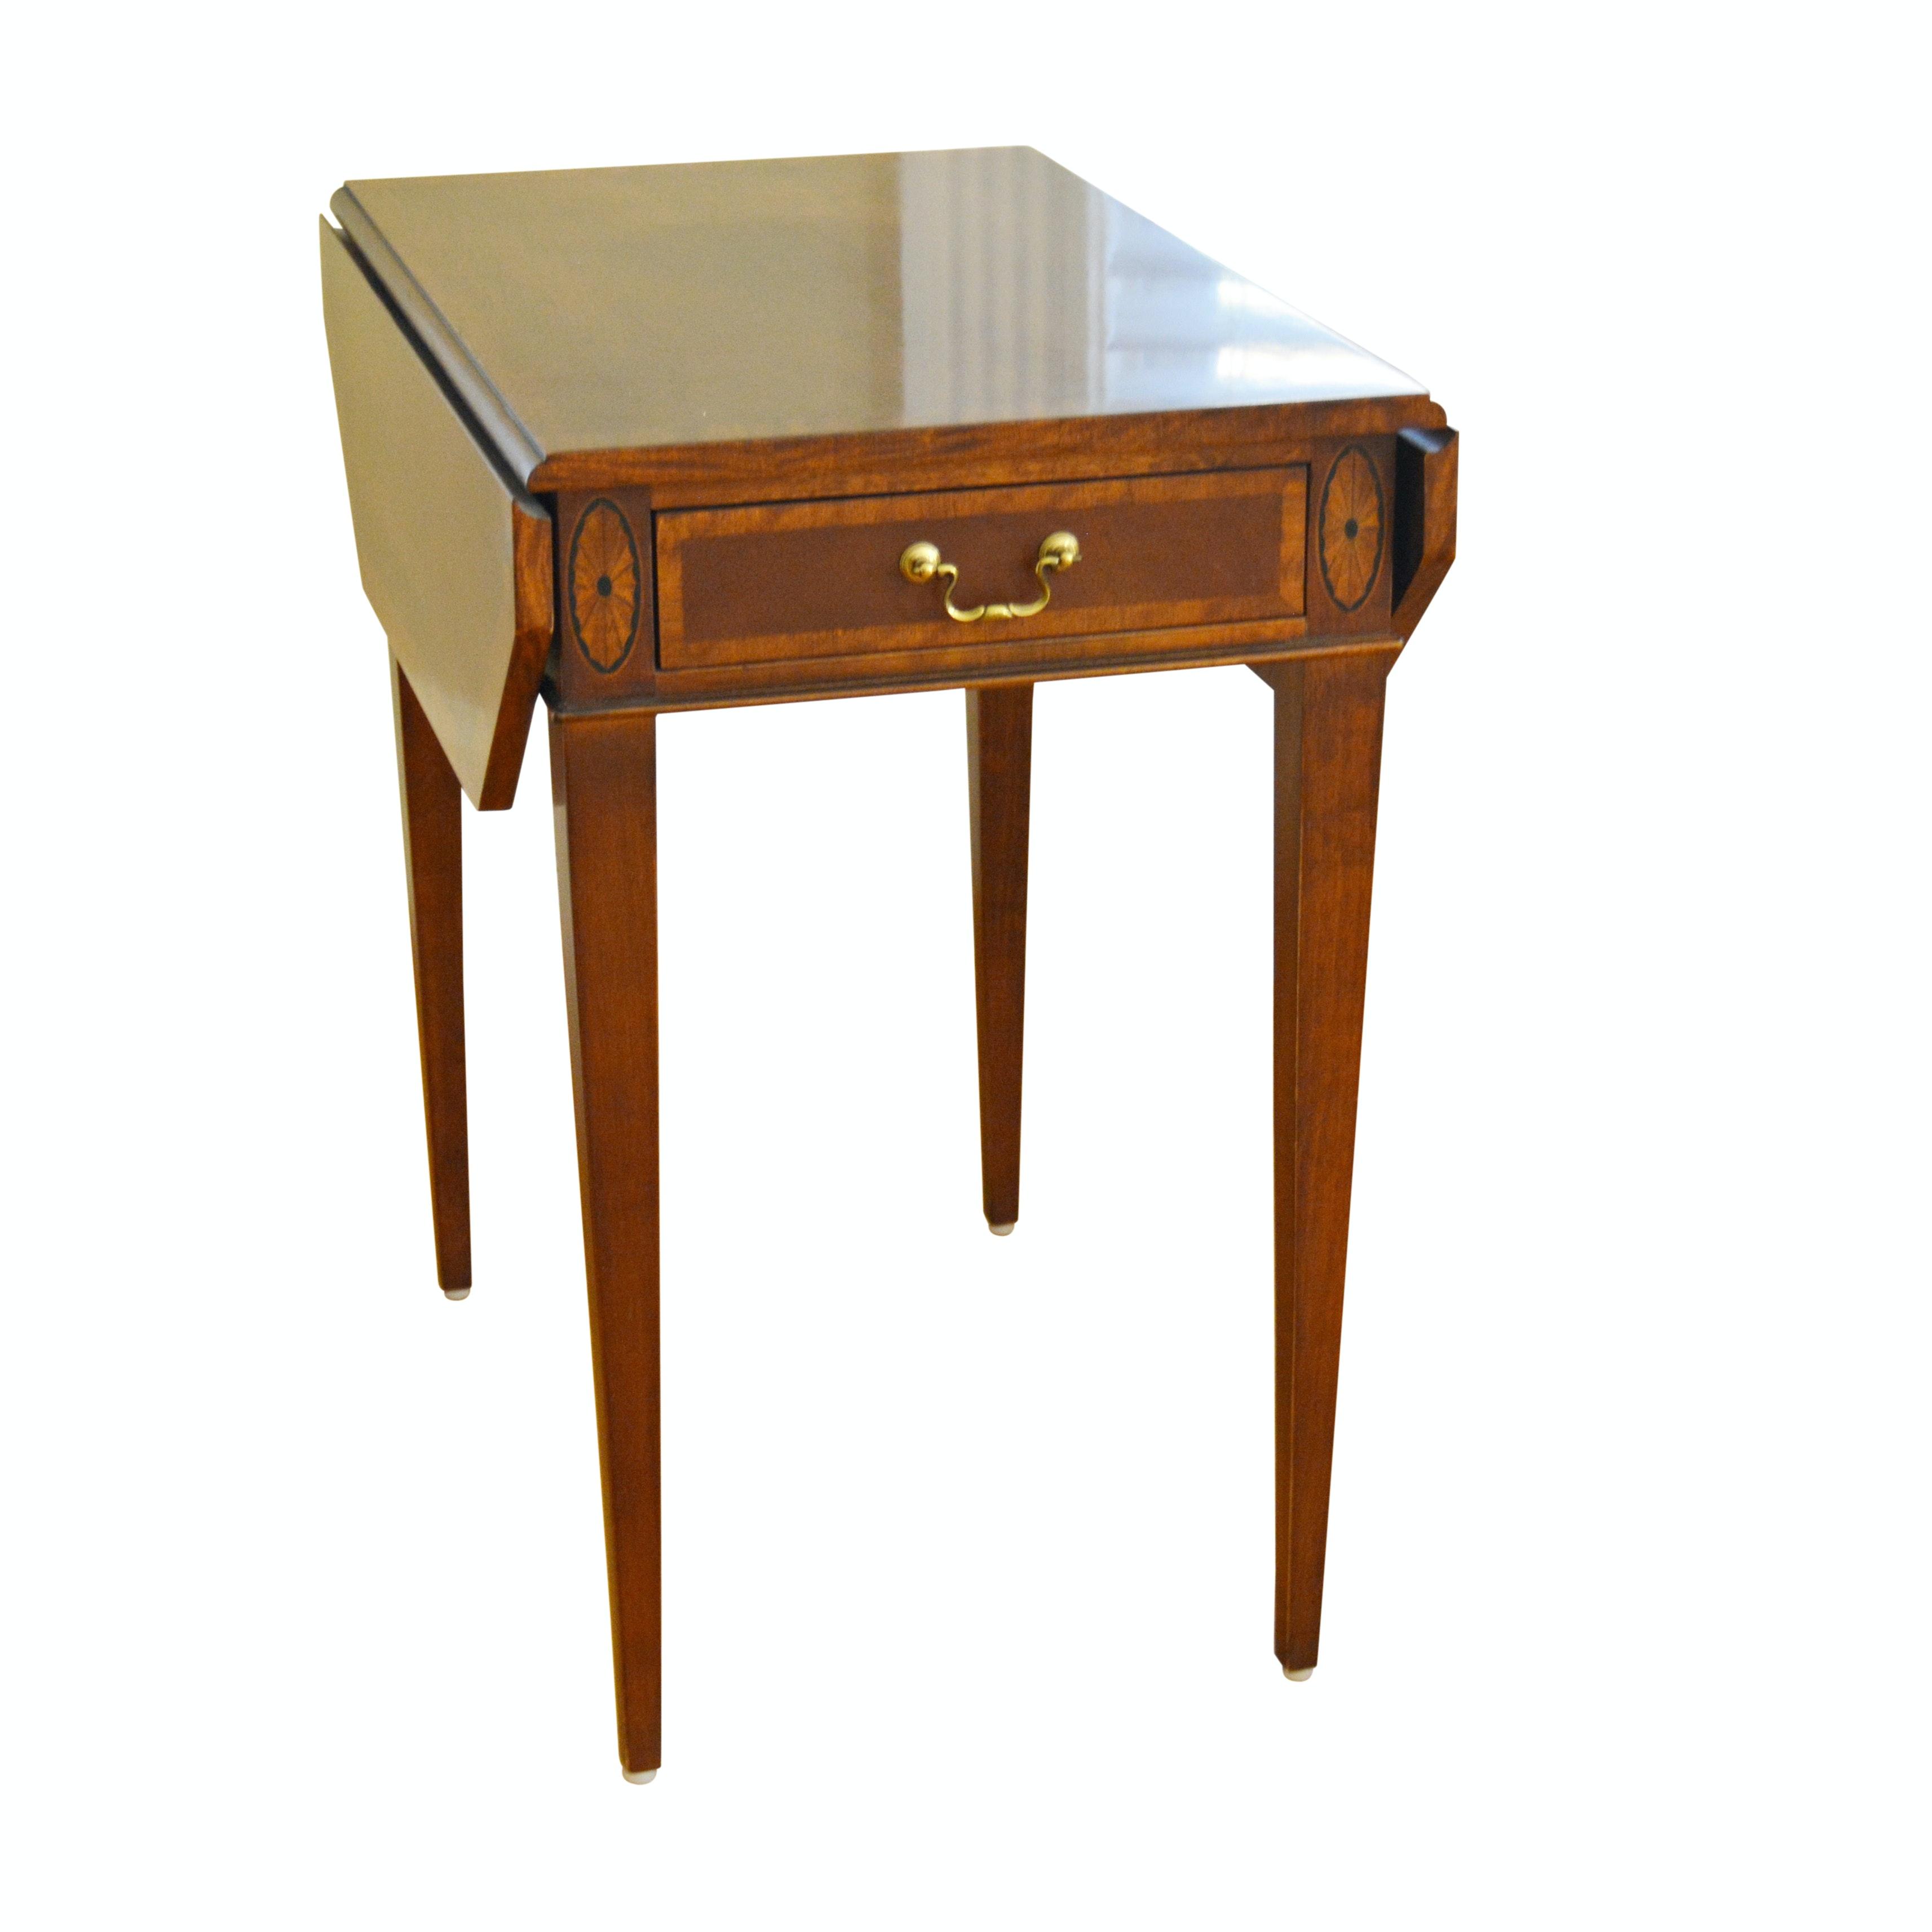 Federal Style Pembroke Side Table by Henredon